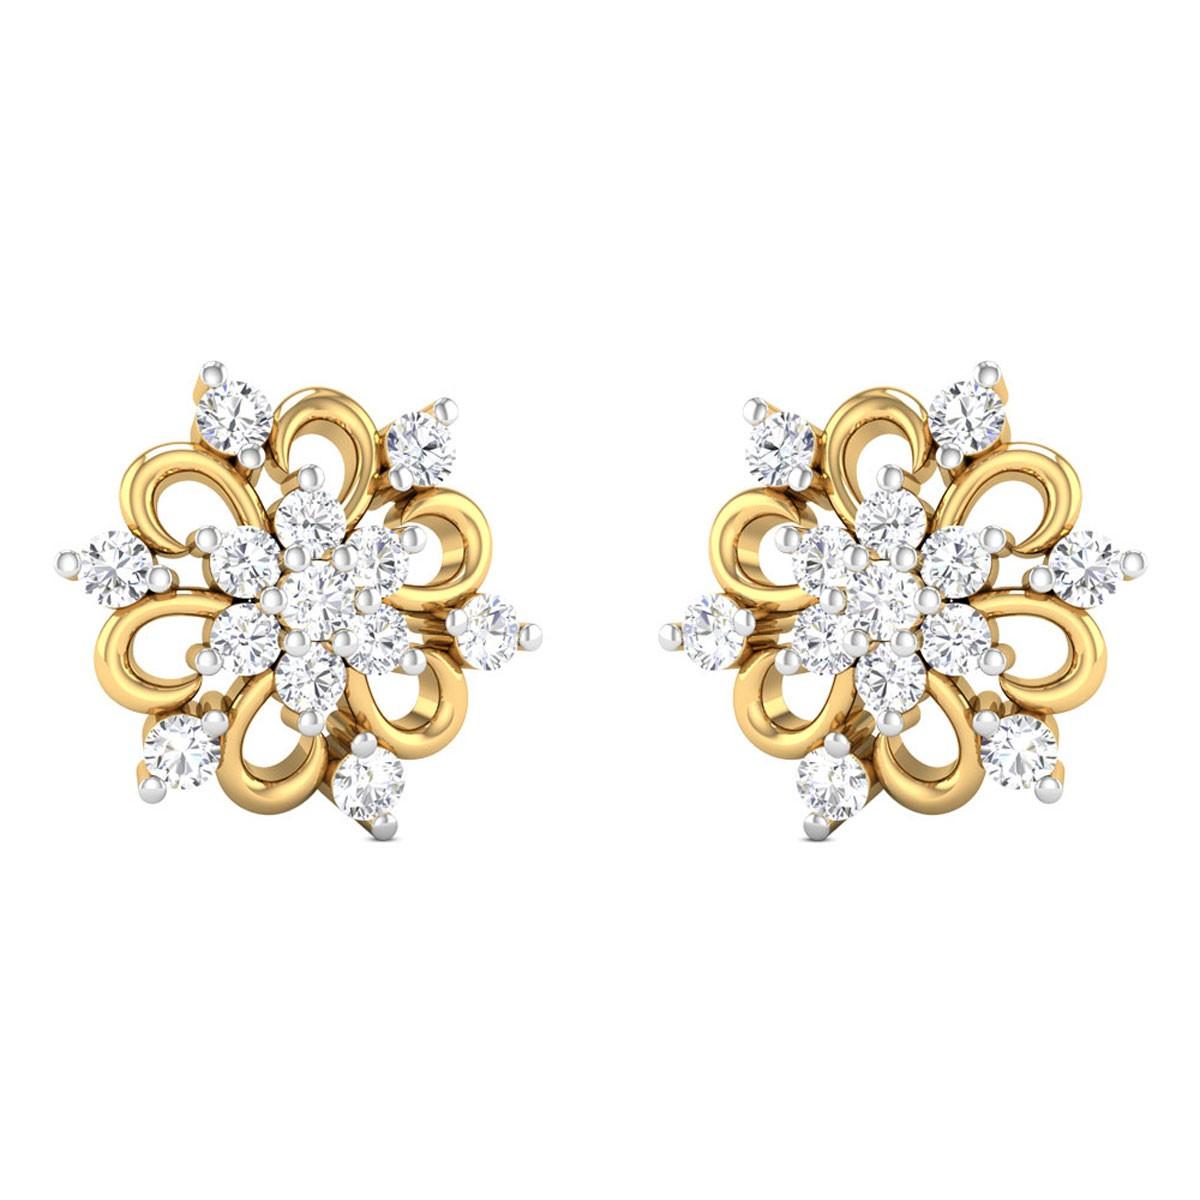 Vanessa Diamond Earrings